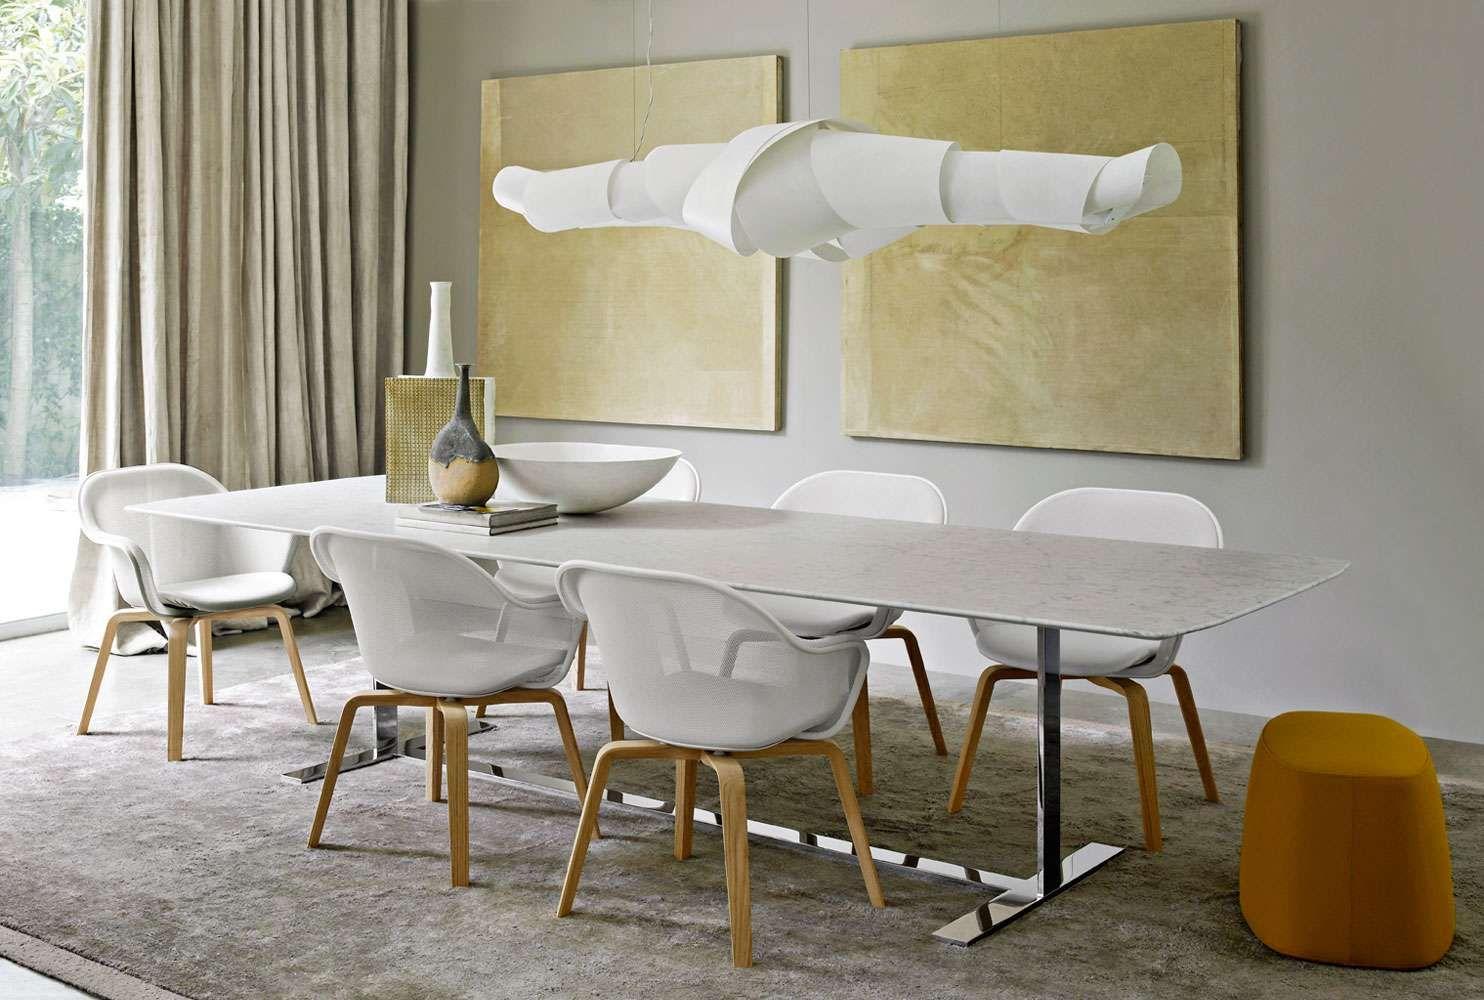 Luta '14  B&b Italia  H&h Dubai  Furniture  Dining Chairs Amazing Dining Room Furniture Dubai Decorating Inspiration